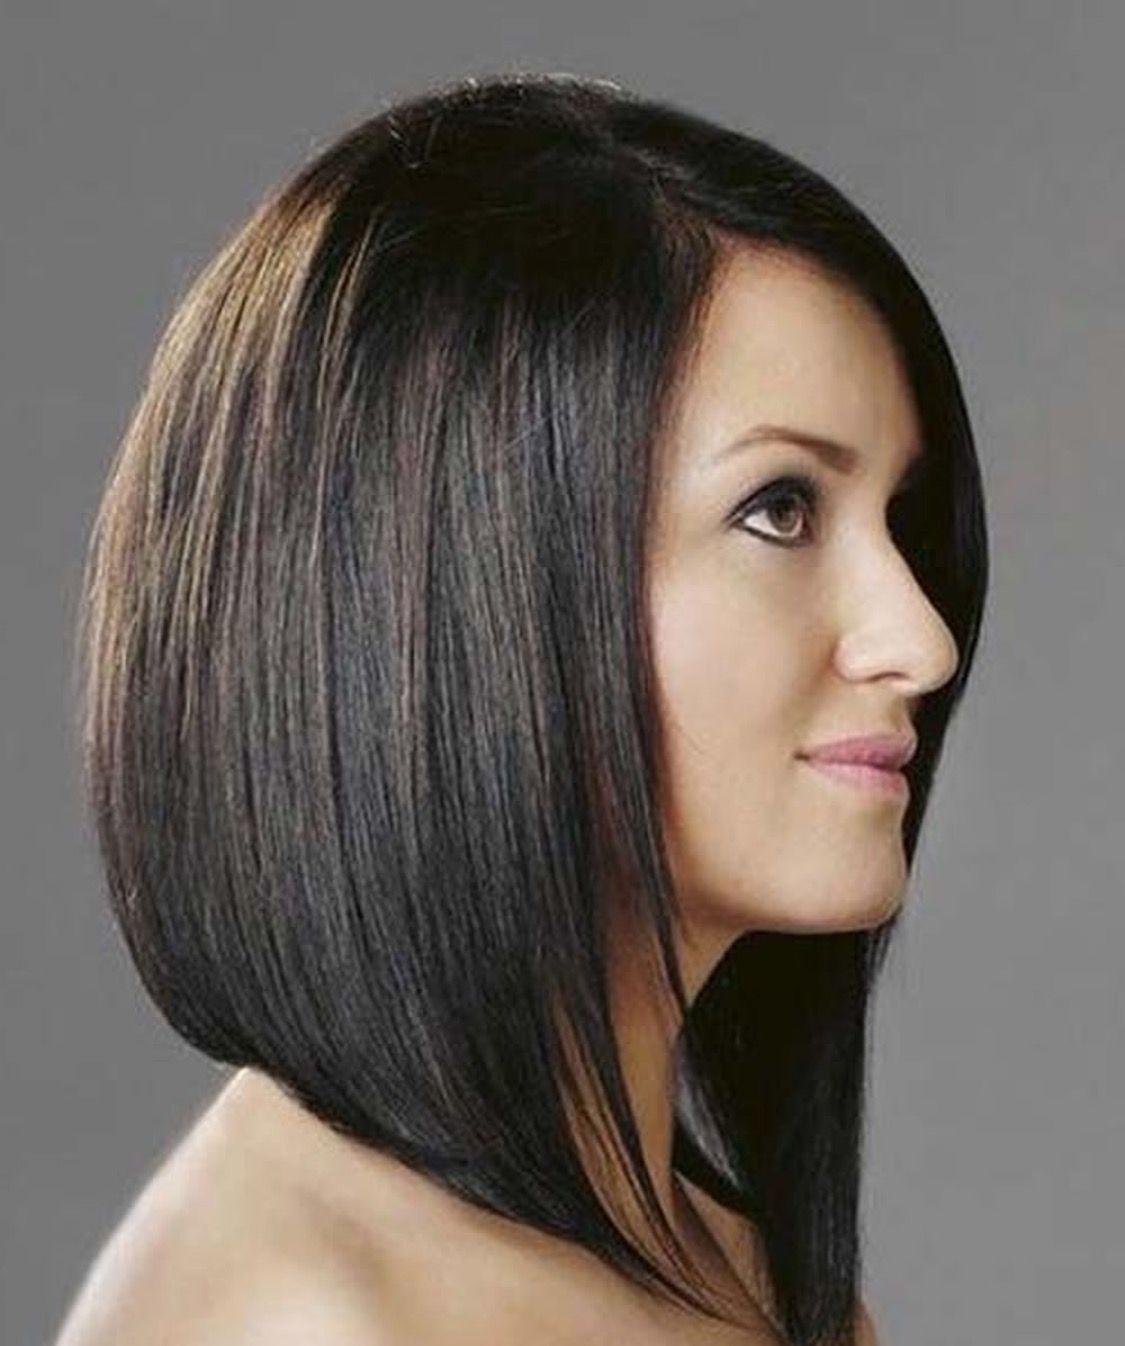 New Style Haircut Girl 2018 Wavy Haircut